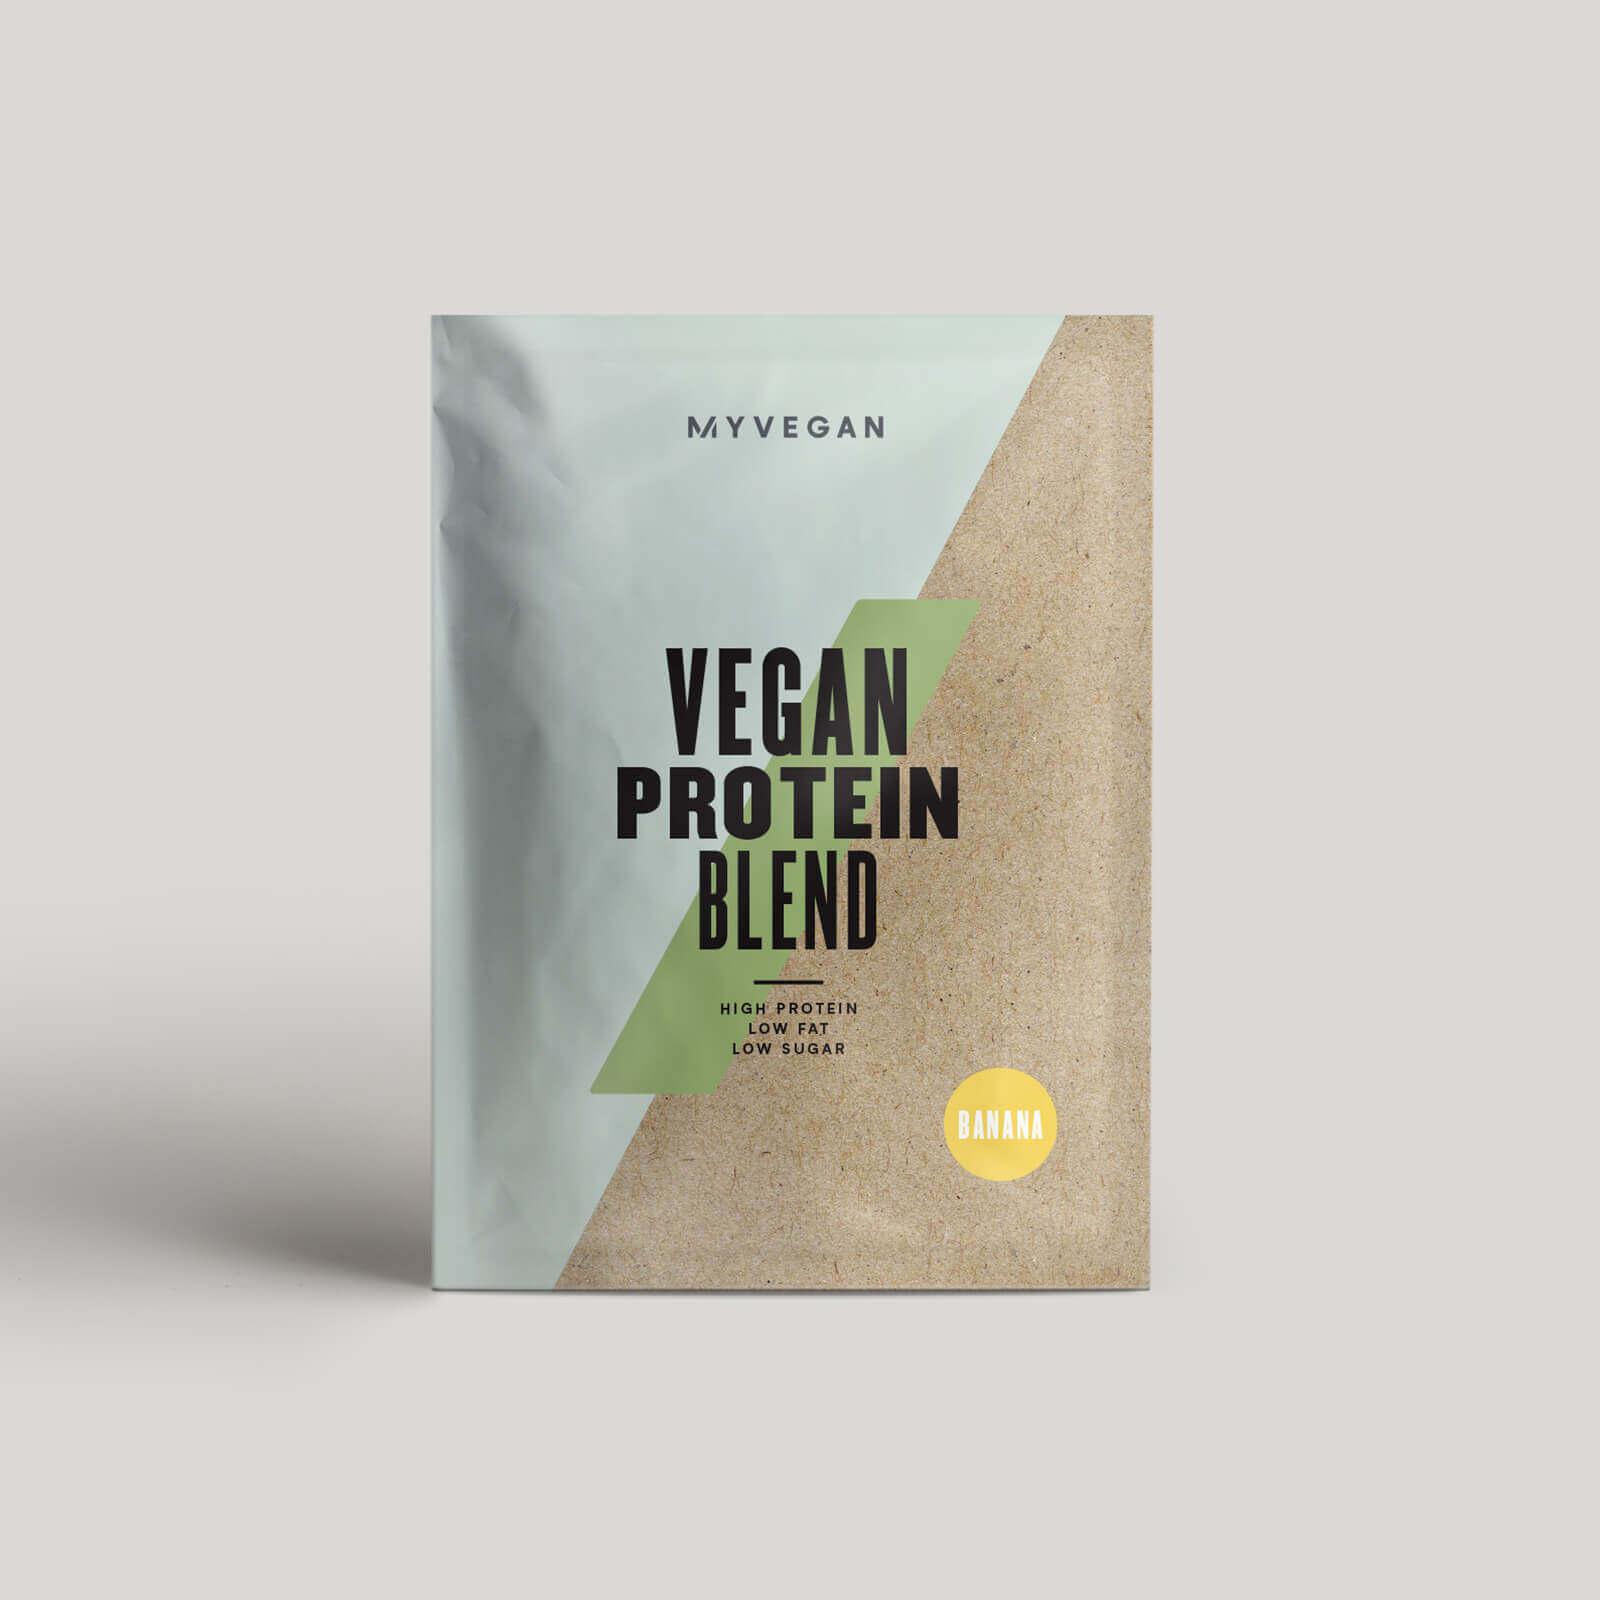 Myvegan Vegan Protein Blend (Sample) - Cacao and Orange